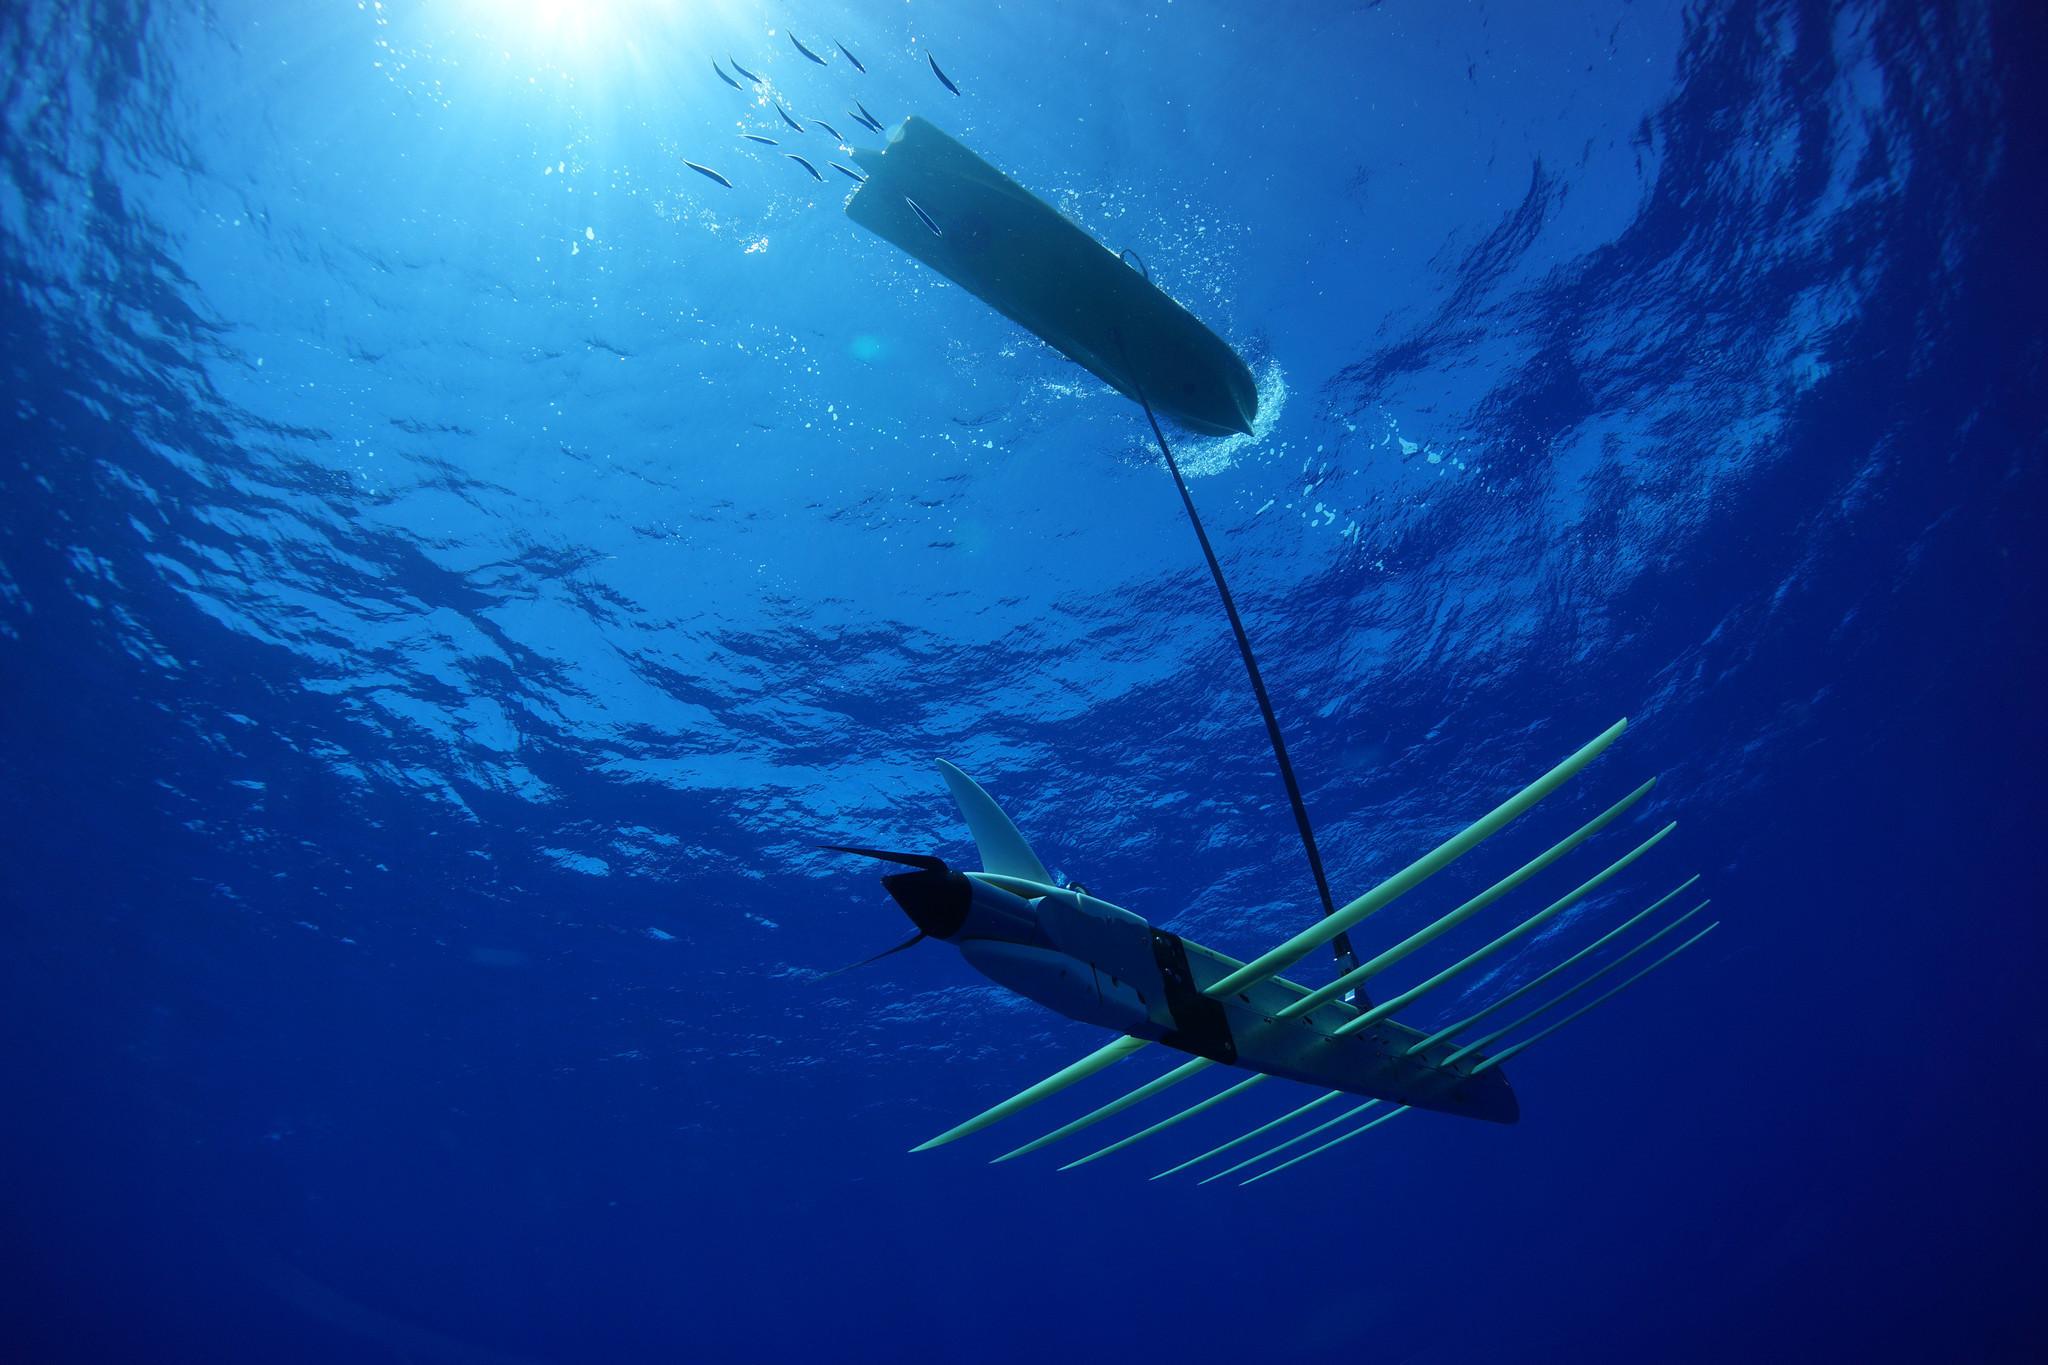 Boeing To Acquire Ocean Drone Maker Liquid Robotics La Times